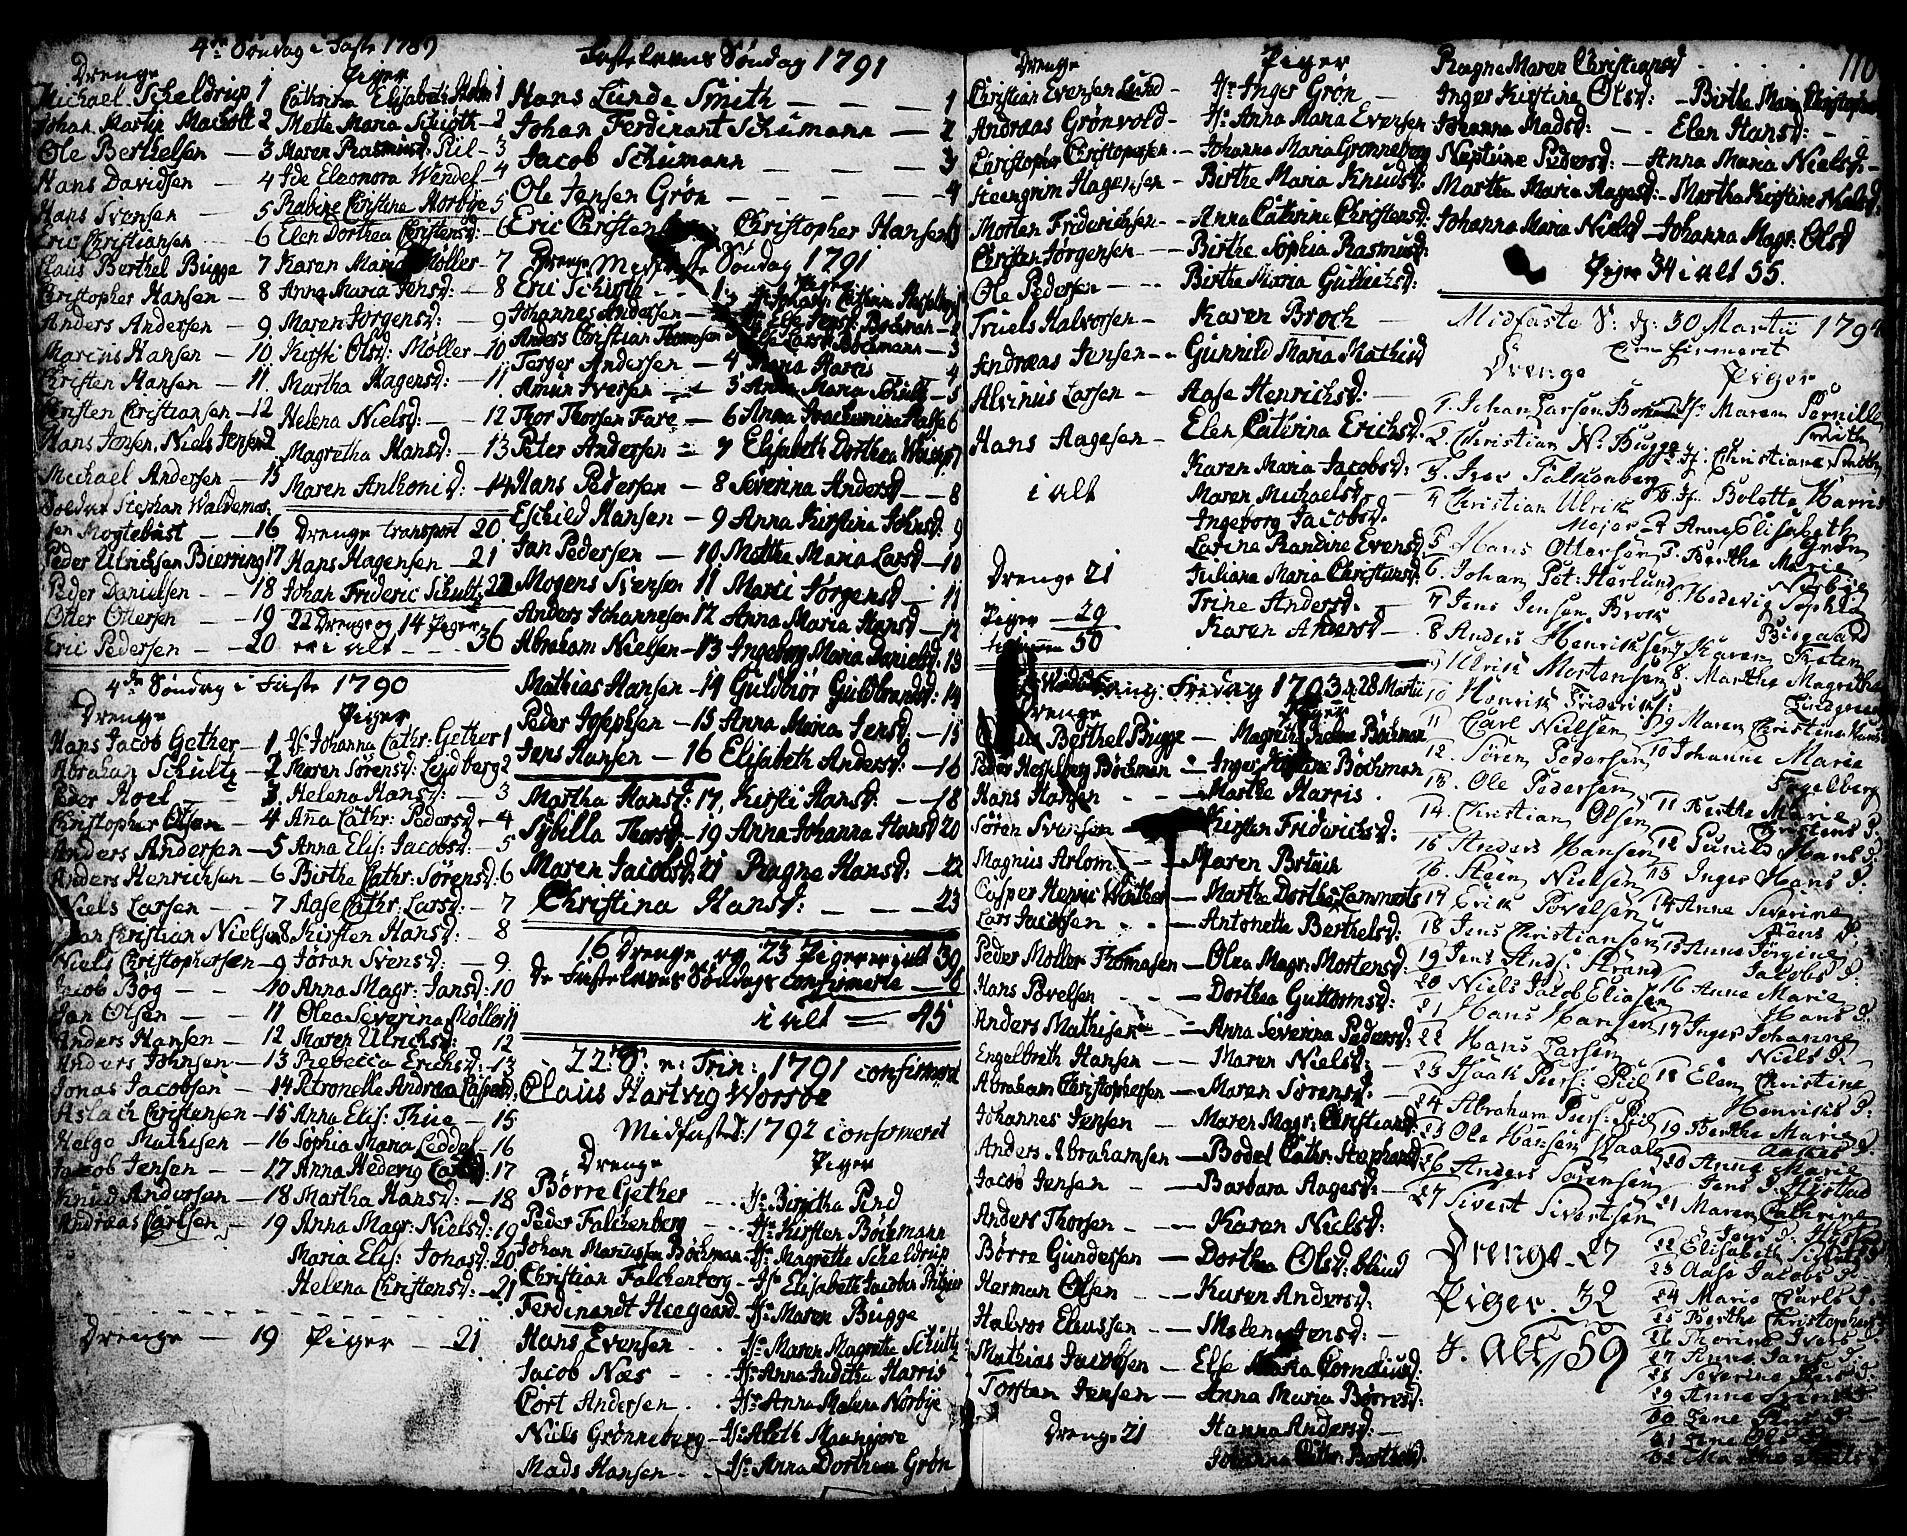 SAKO, Larvik kirkebøker, G/Ga/L0001: Klokkerbok nr. I 1, 1785-1807, s. 110